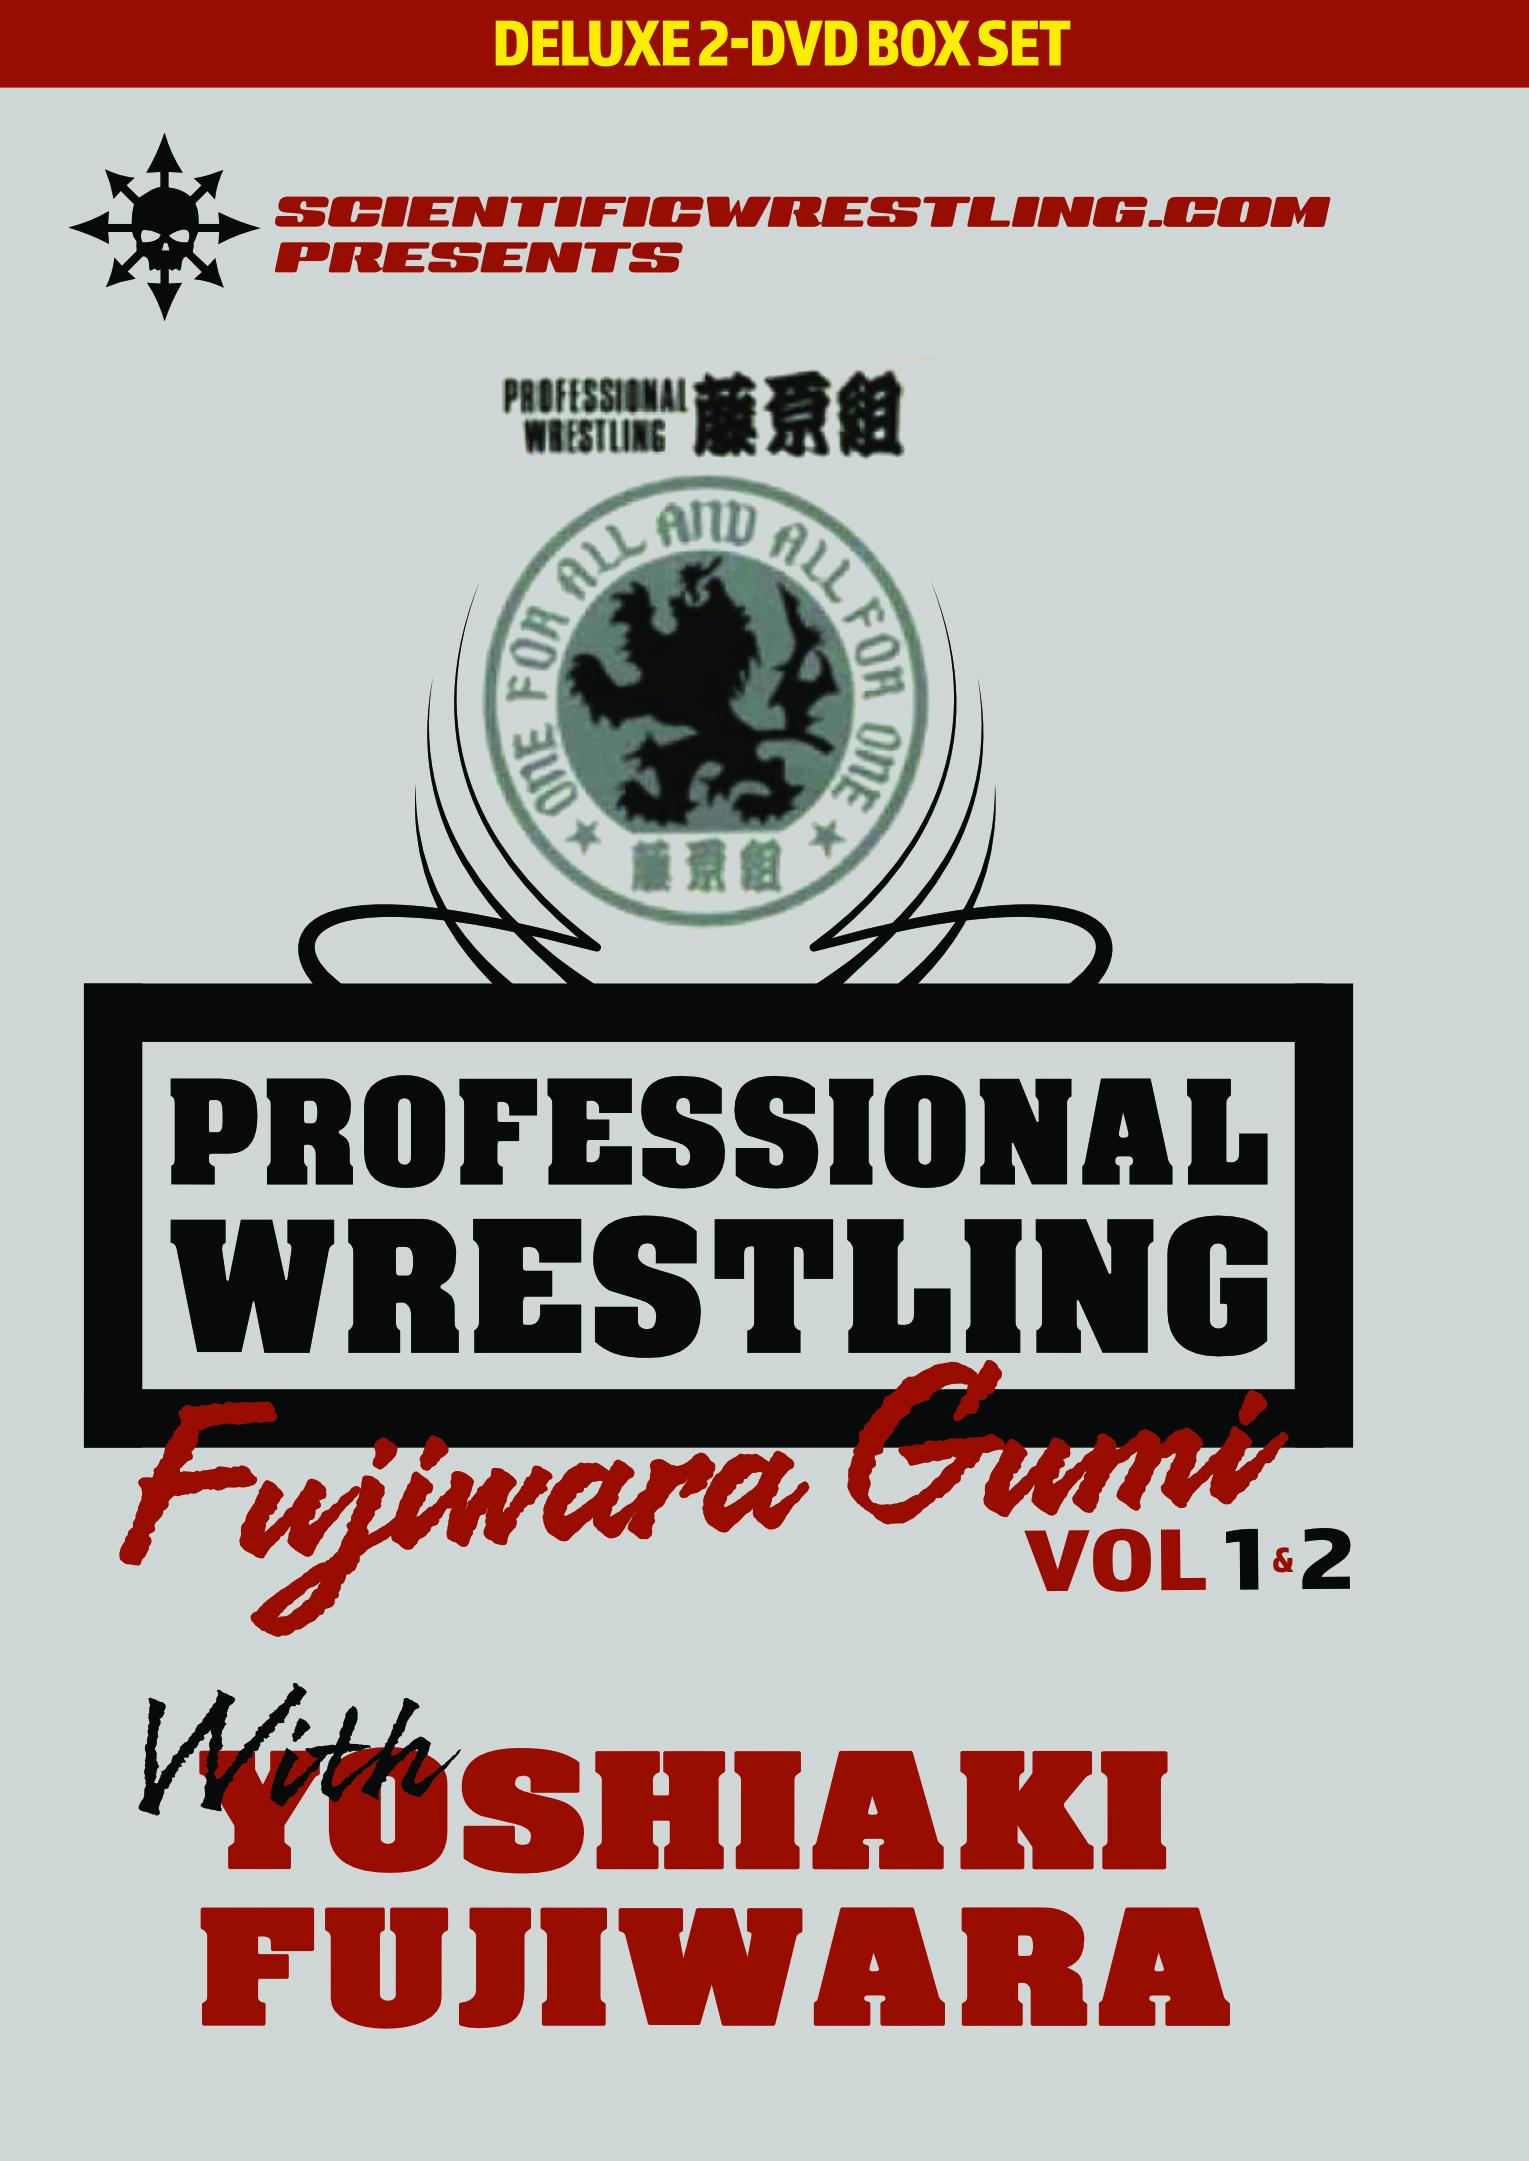 The Professional Wrestling Fujiwara-Gumi DELUXE 2 Disc Set